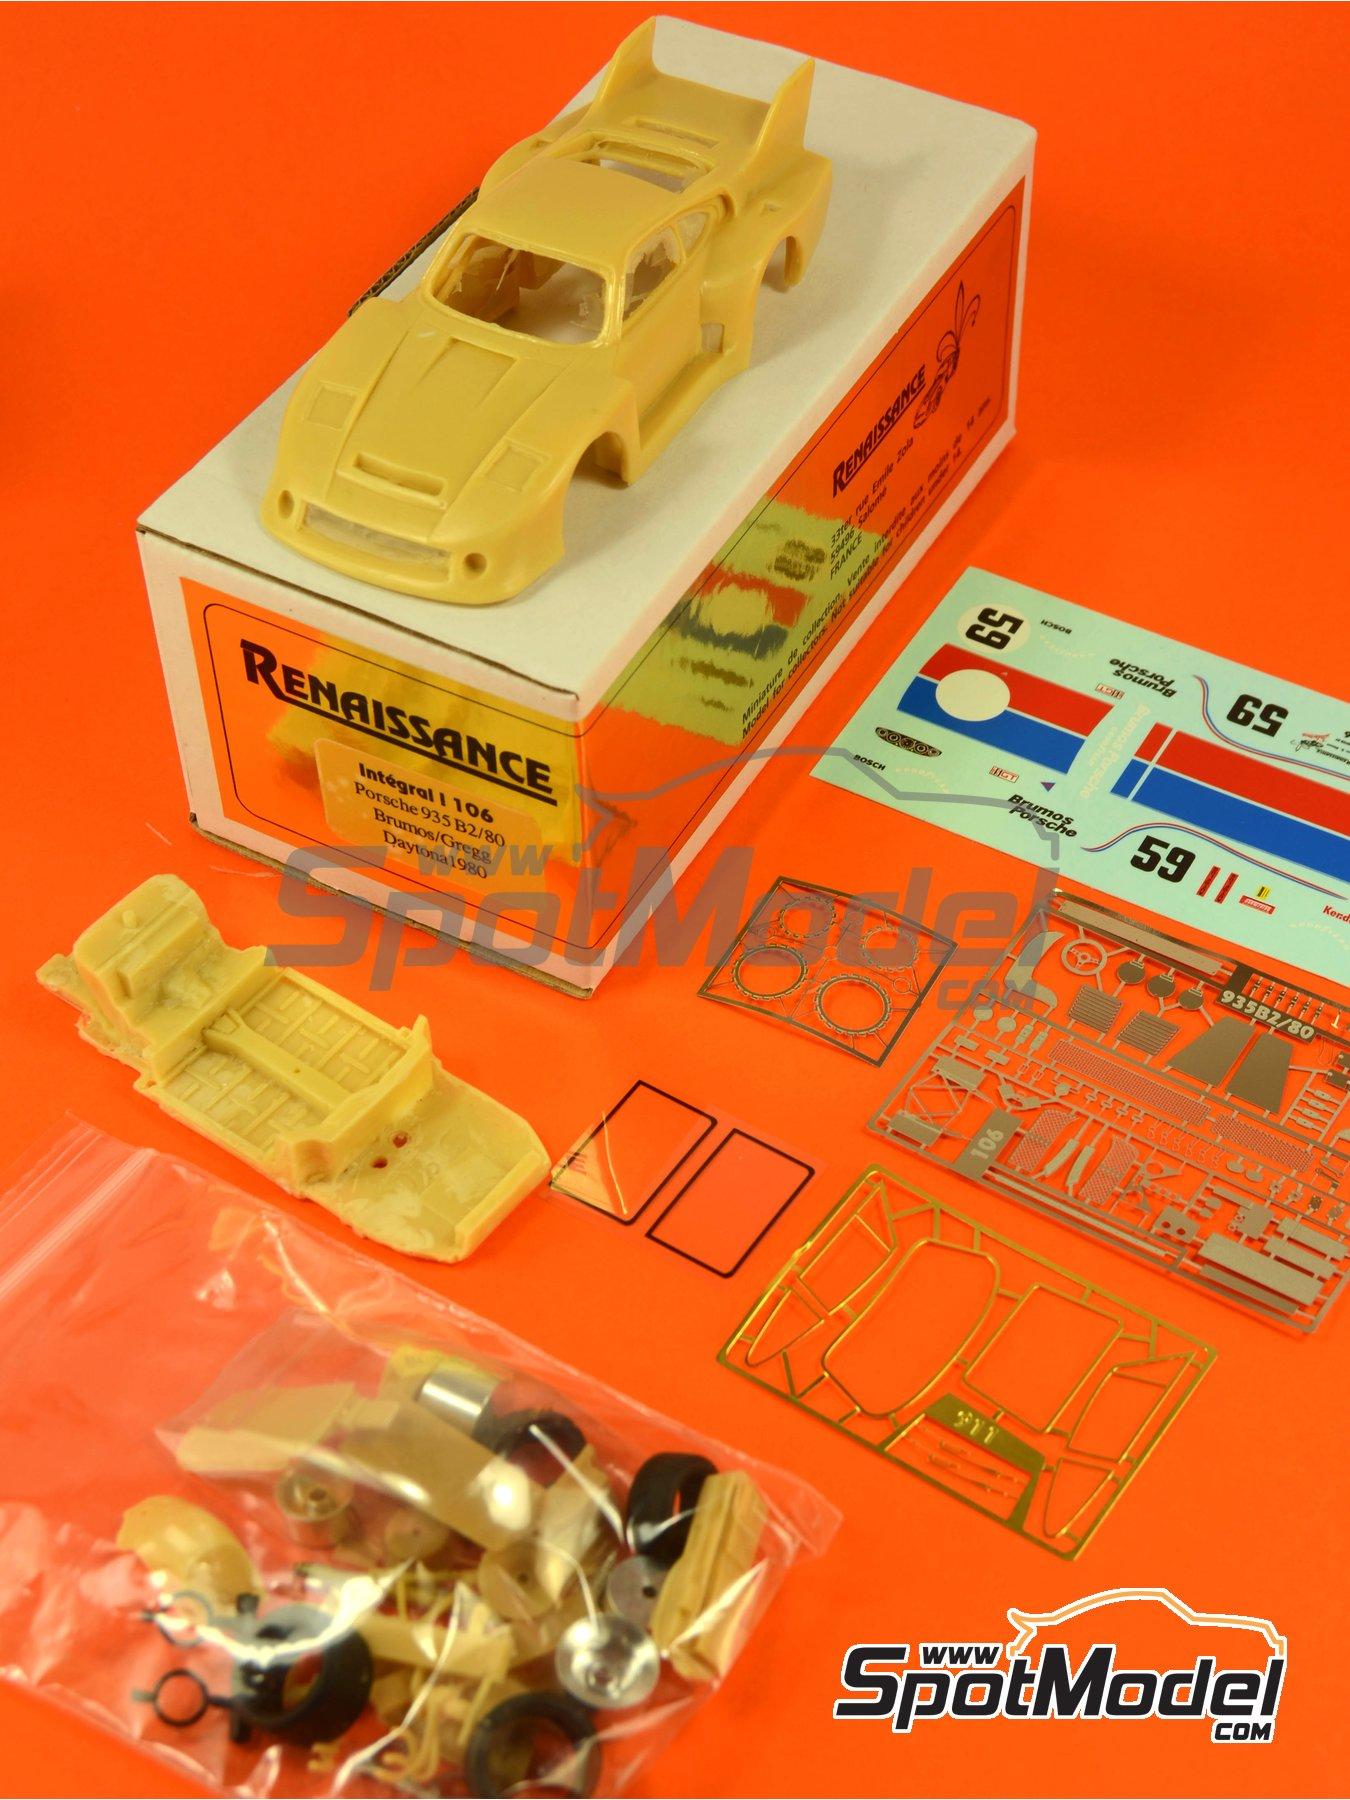 Porsche 935 B2/80 Brumos - 24 Hours of Daytona 1980   Model car kit in 1/43 scale manufactured by Renaissance Models (ref.43-106) image